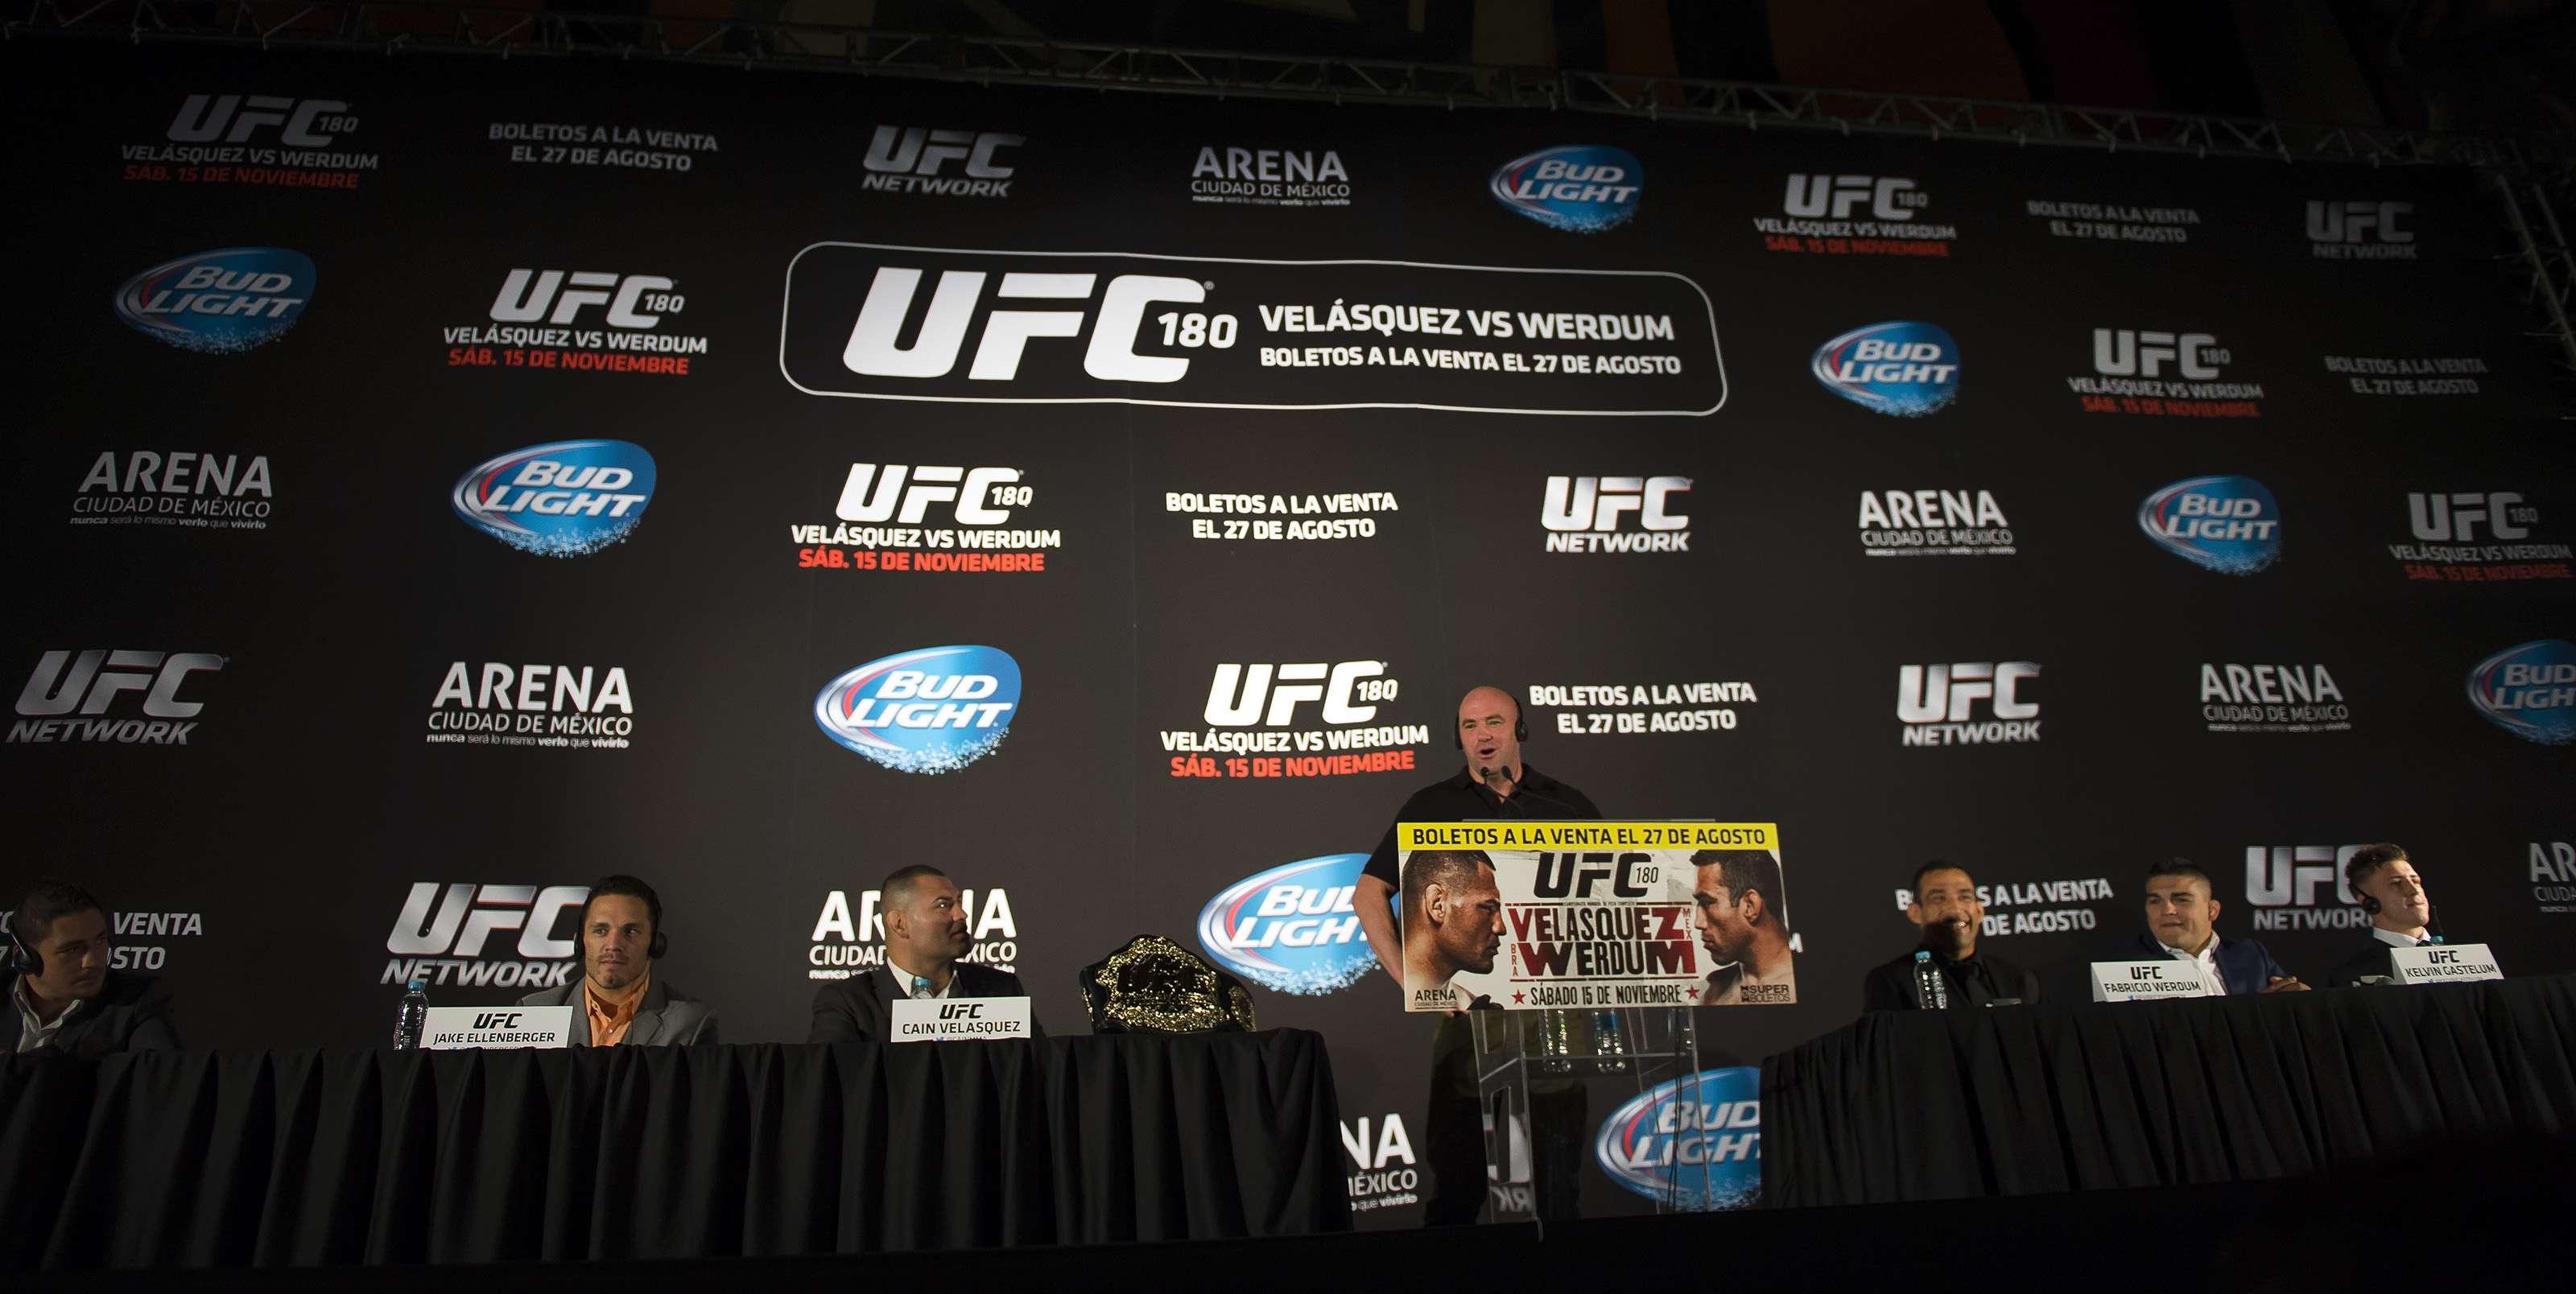 La cartelera del UFC 180 ha sufrido varias modificaciones. Foto: Mexsport